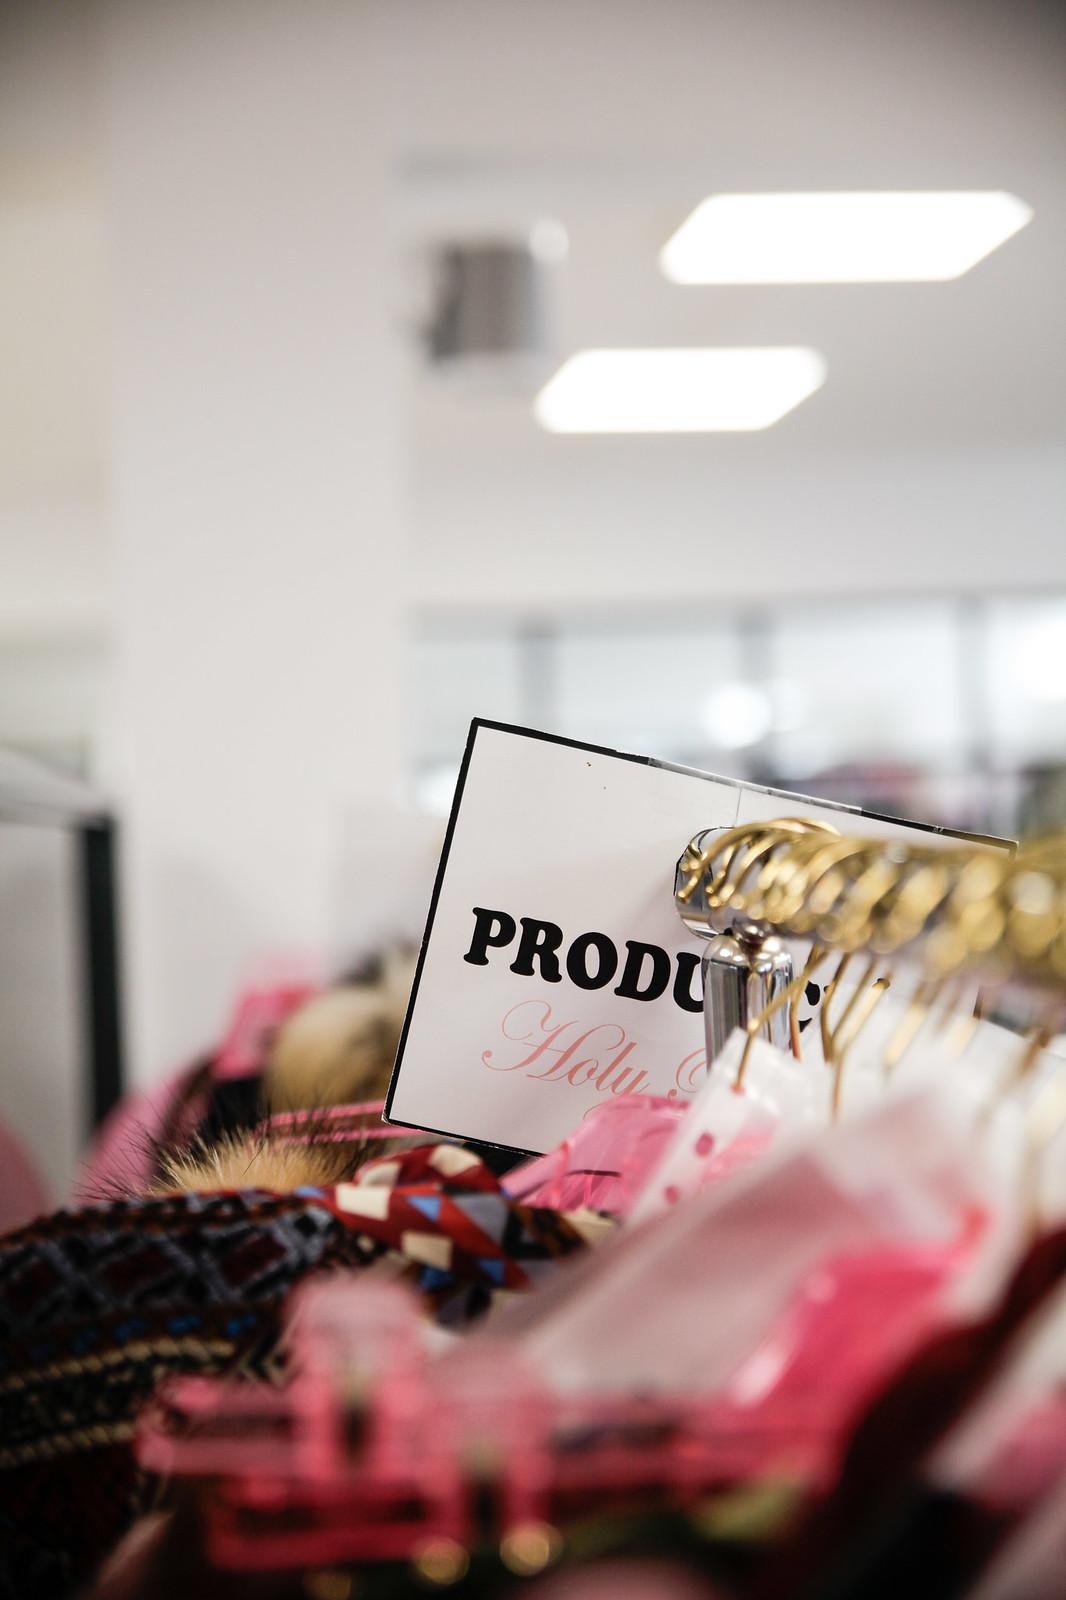 015_Highly_Preppy_abre_su_primera_tienda_en_Bilbao_influencers_fashion_lifestyle_theguestgirl_look_military_khaki_ootd